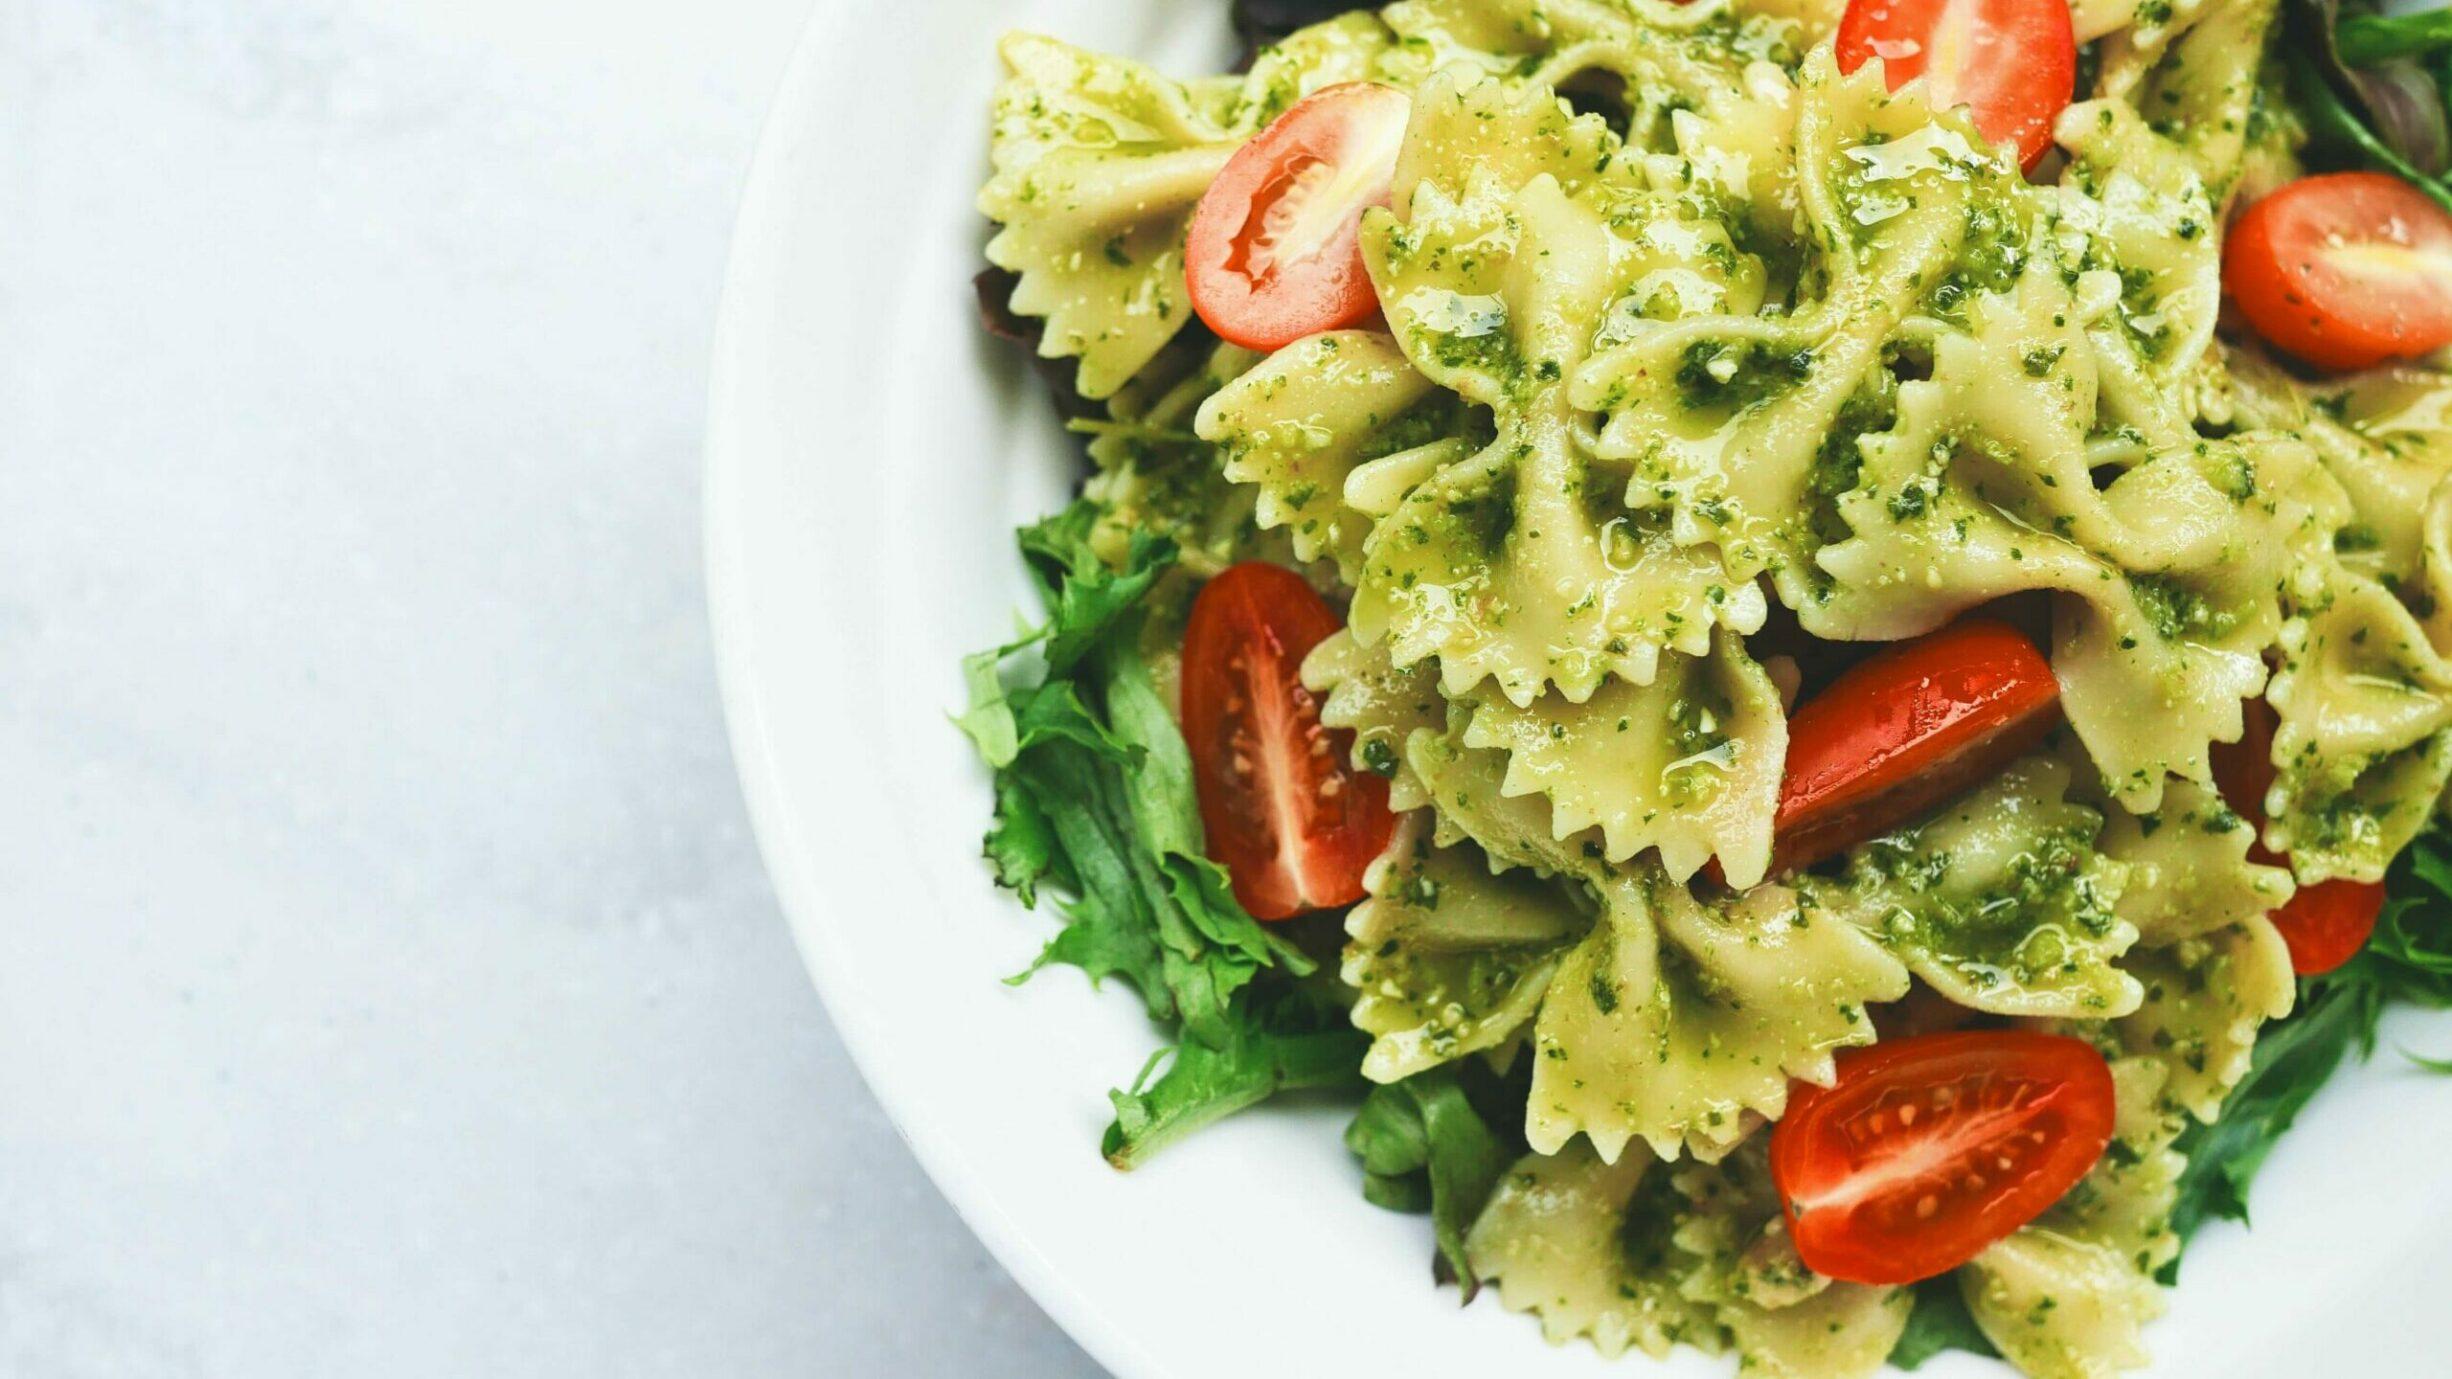 bowtie pasta with pesto tomatoes and arugula